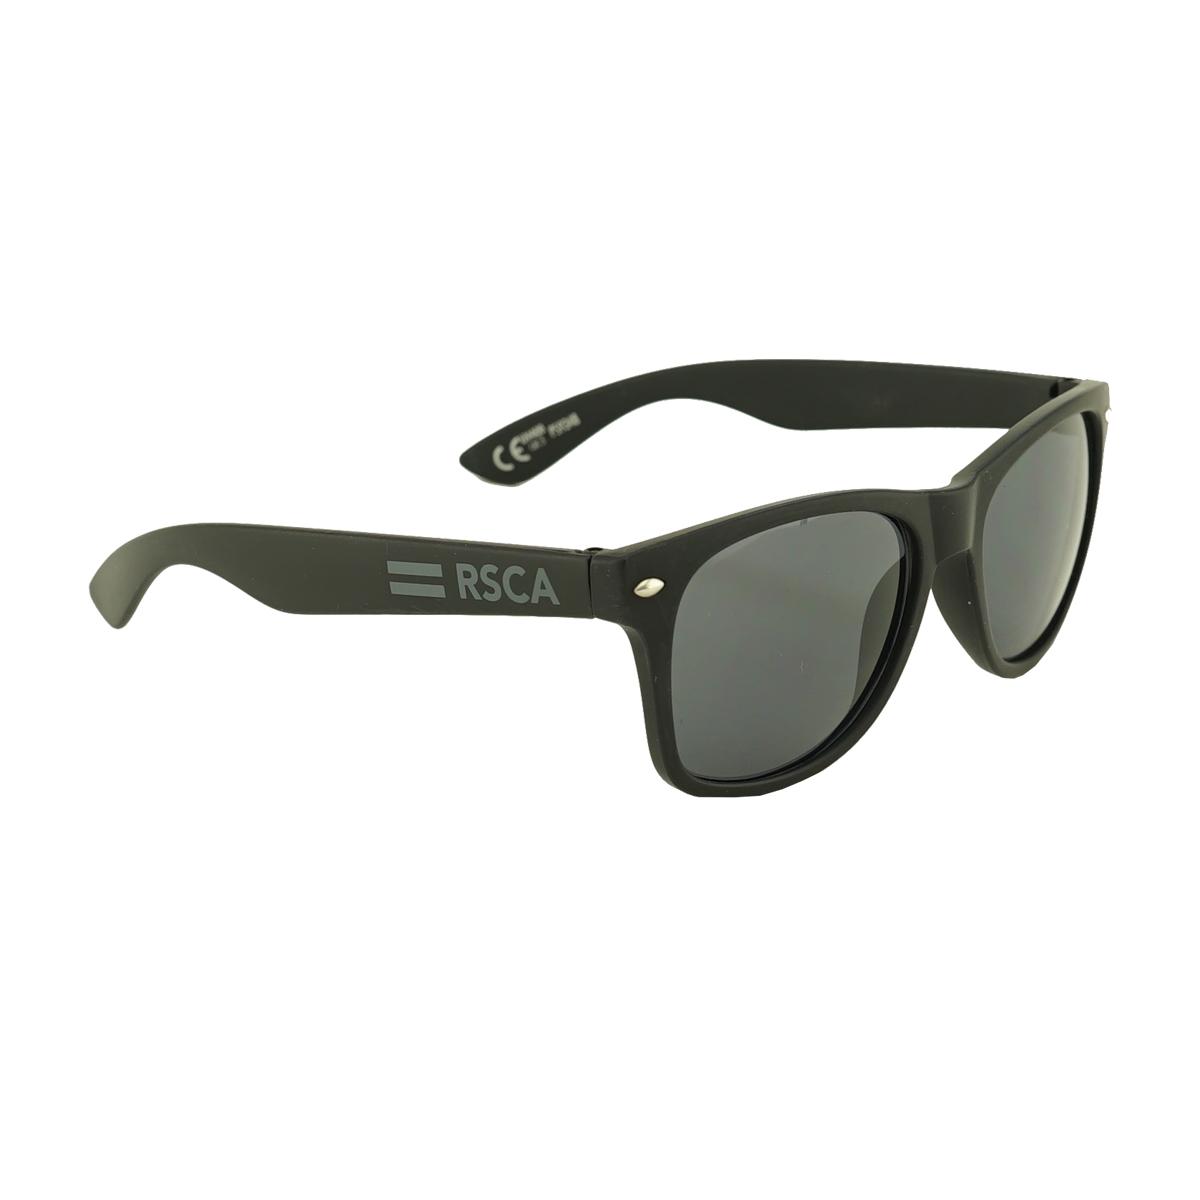 RSCA Sunglasses - Black